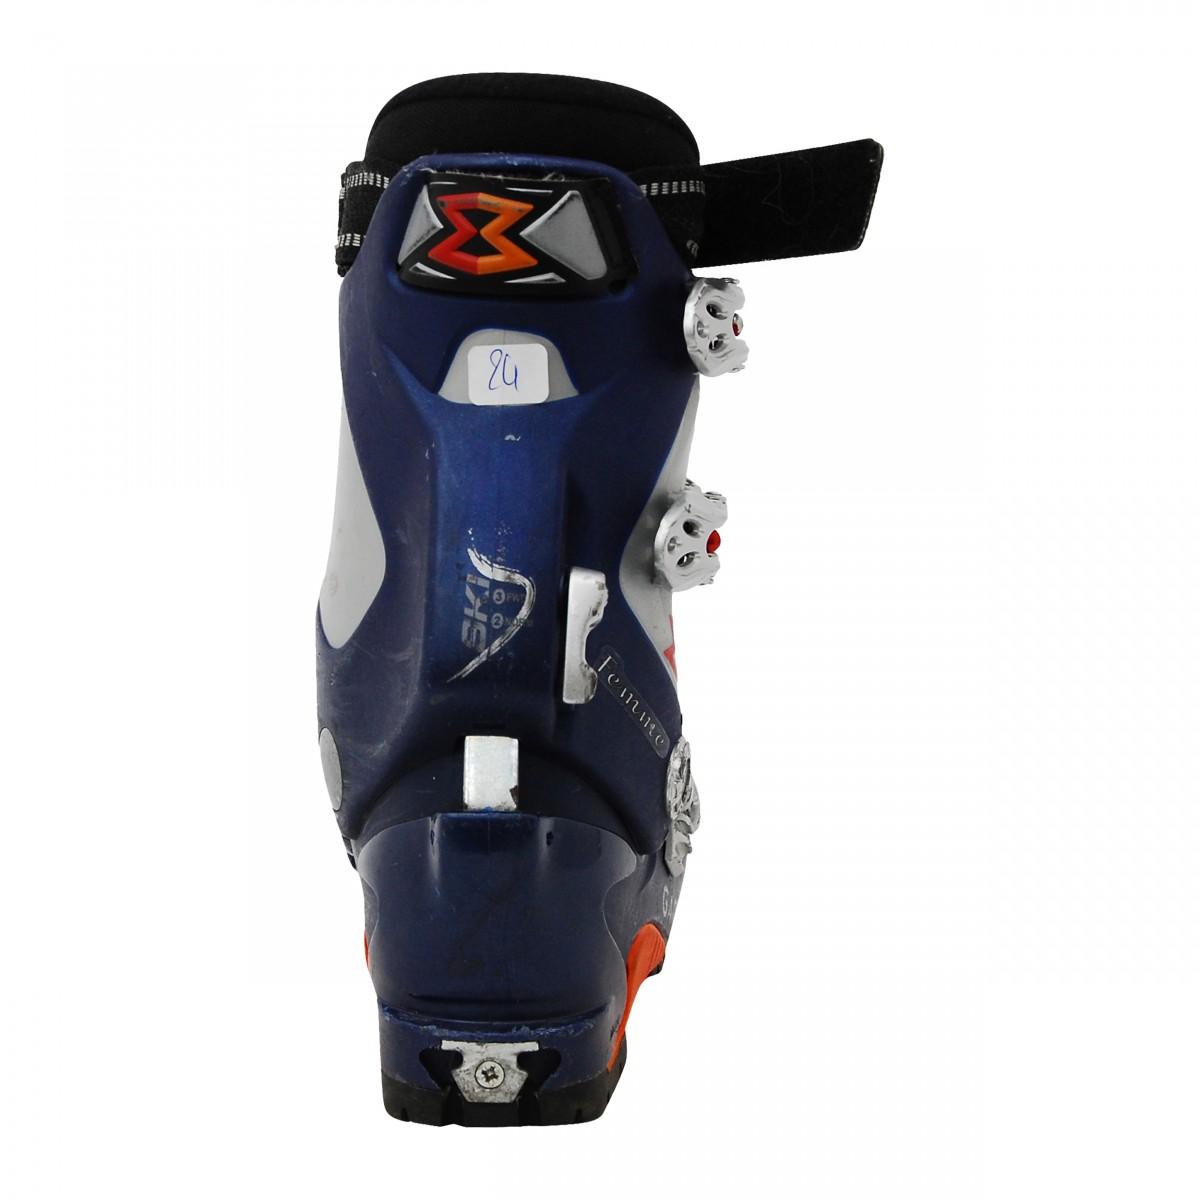 Chaussure-de-ski-rando-occasion-Garmont-Megaride-mg-bleu miniature 3